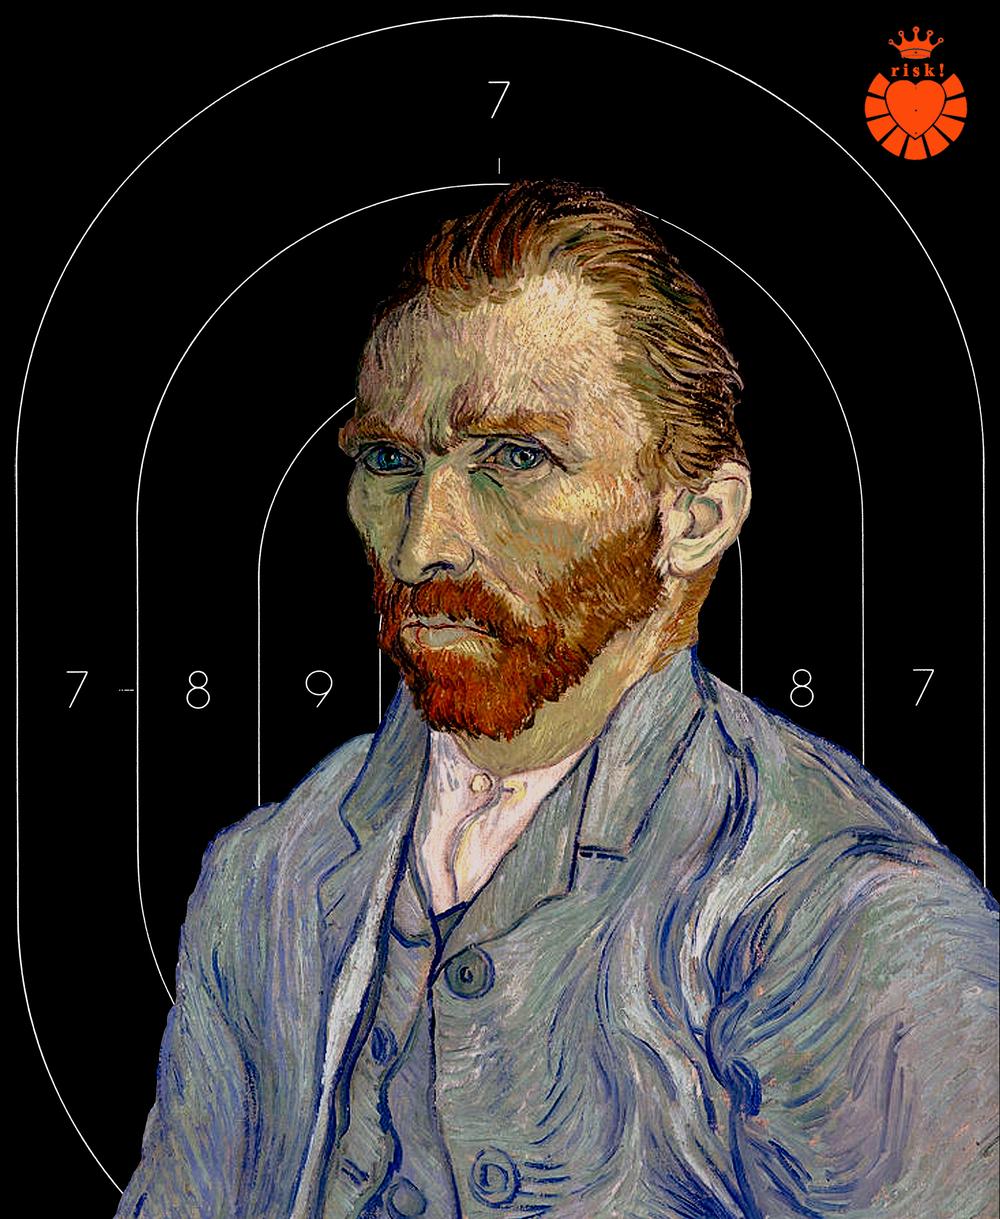 Van Gogh's Risk / 24 x 19